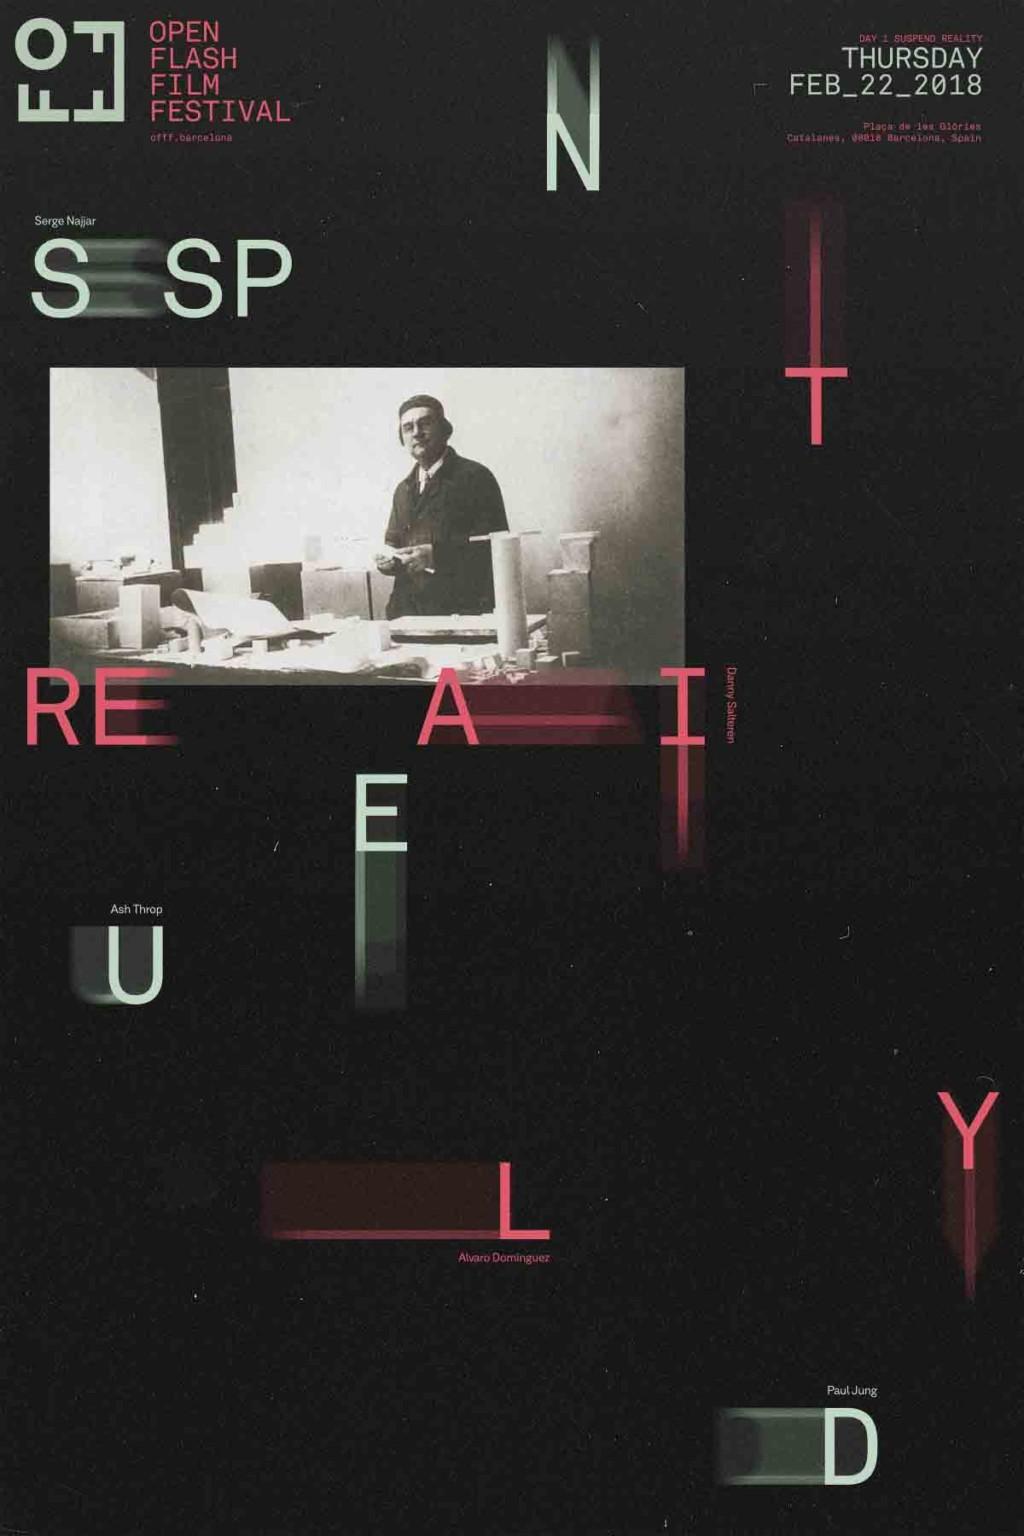 Andrew Chiou → Graphic Designer OFFF Festival